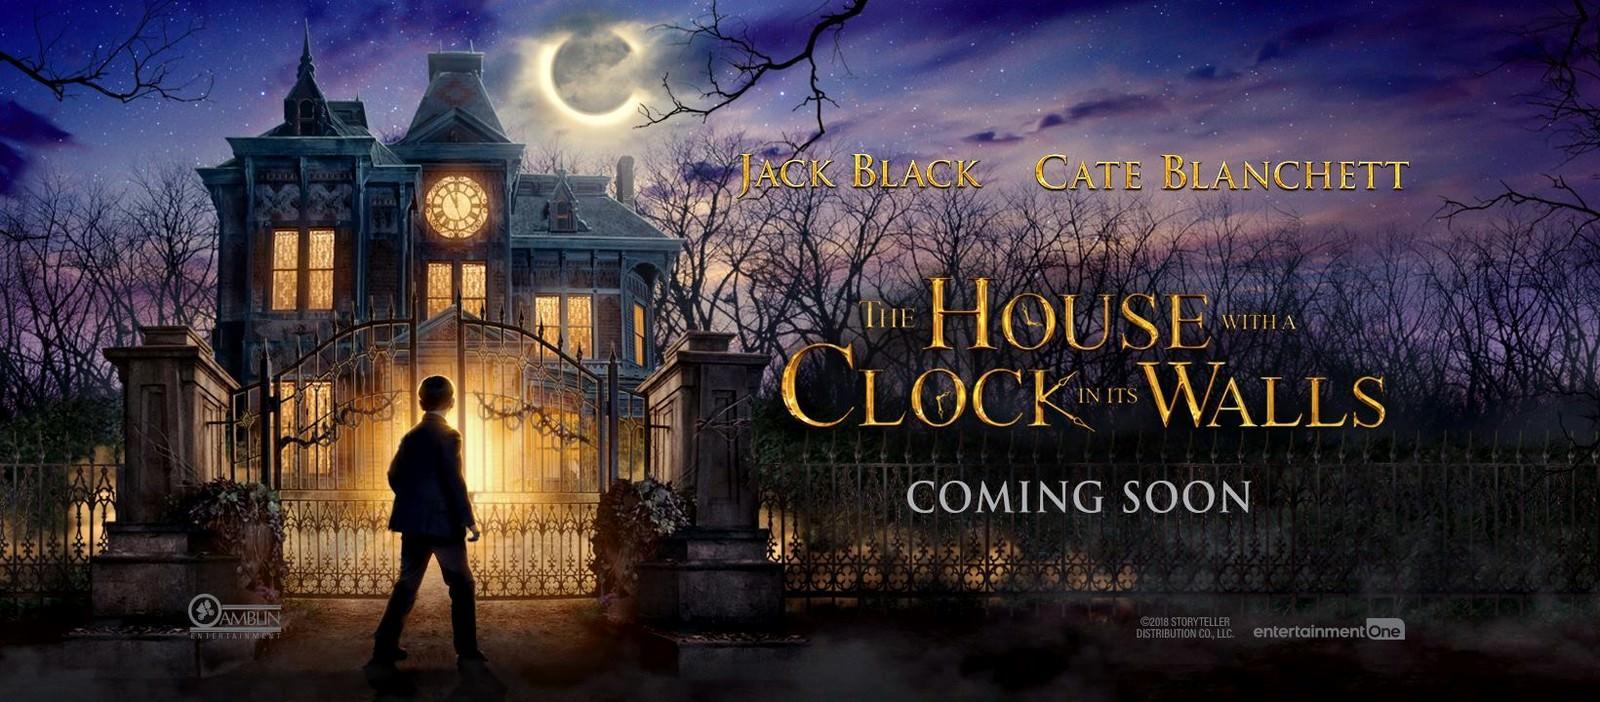 Movie, The House with a Clock in its Walls(美國, 2018年) / 滴答屋(台灣) / 魔鐘奇幻屋(香港), 電影海報, 美國, 橫版